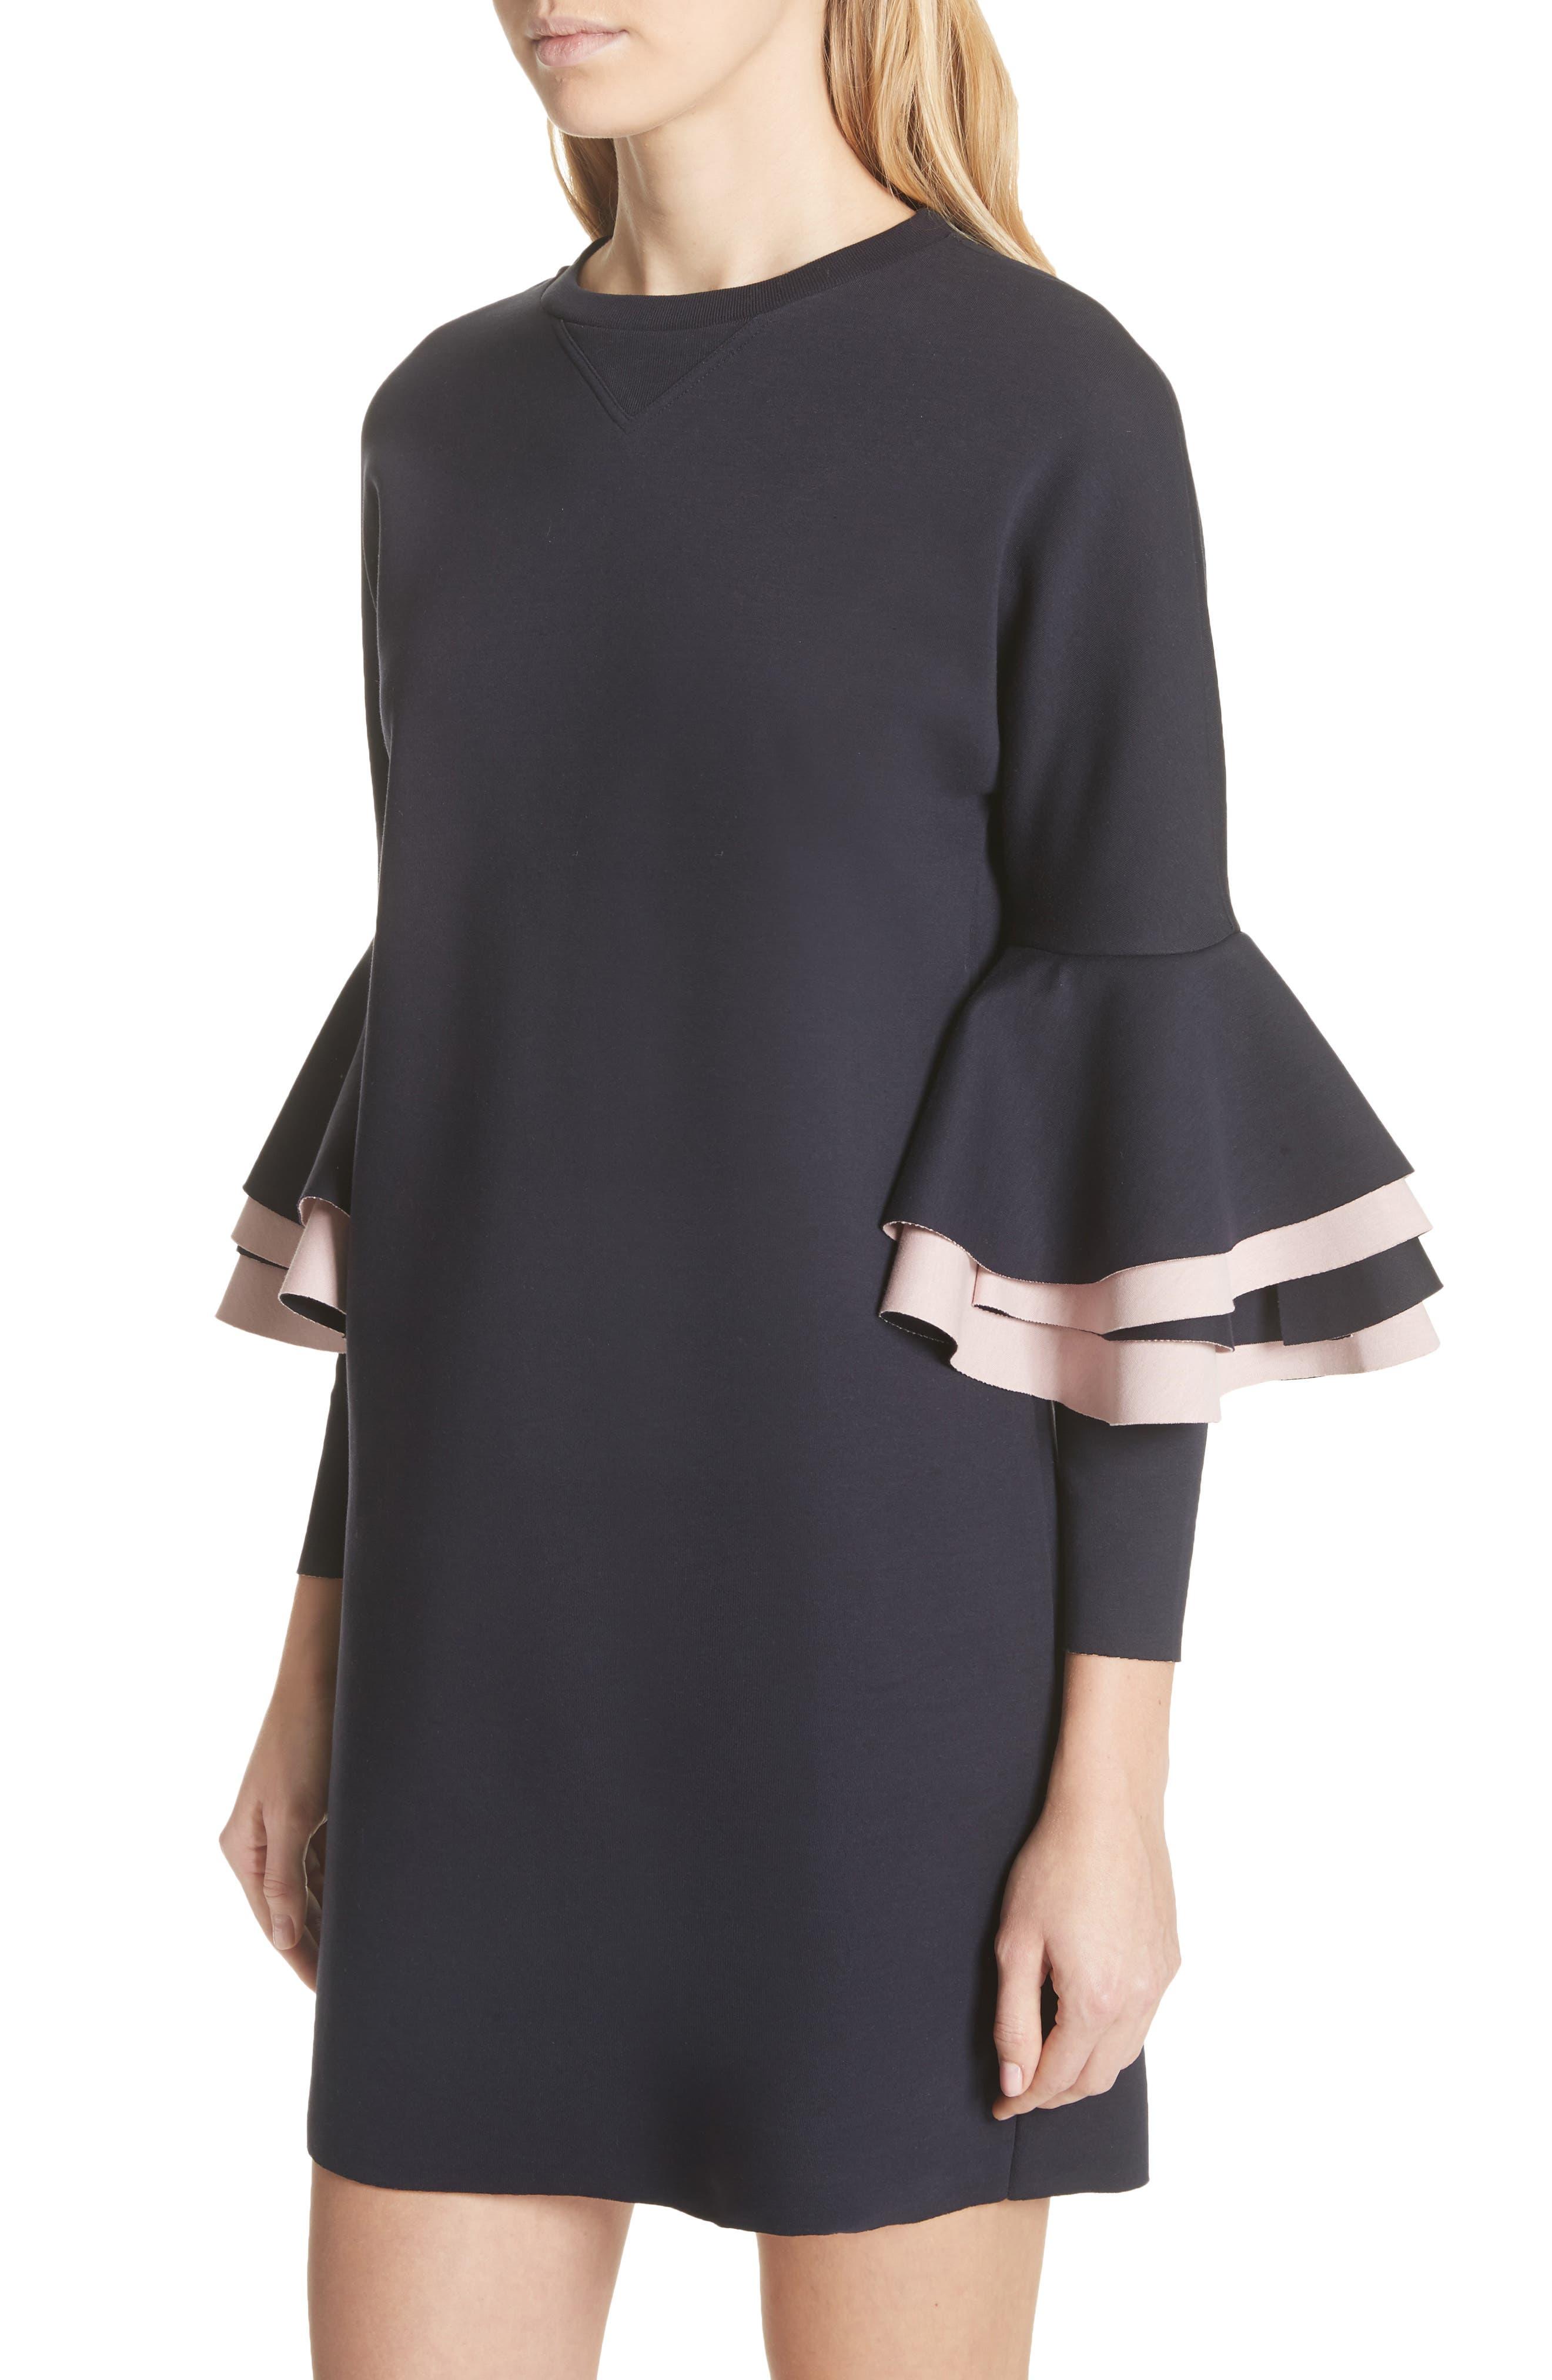 Chloae Frill Sleeve Sweatshirt Dress,                             Alternate thumbnail 4, color,                             410